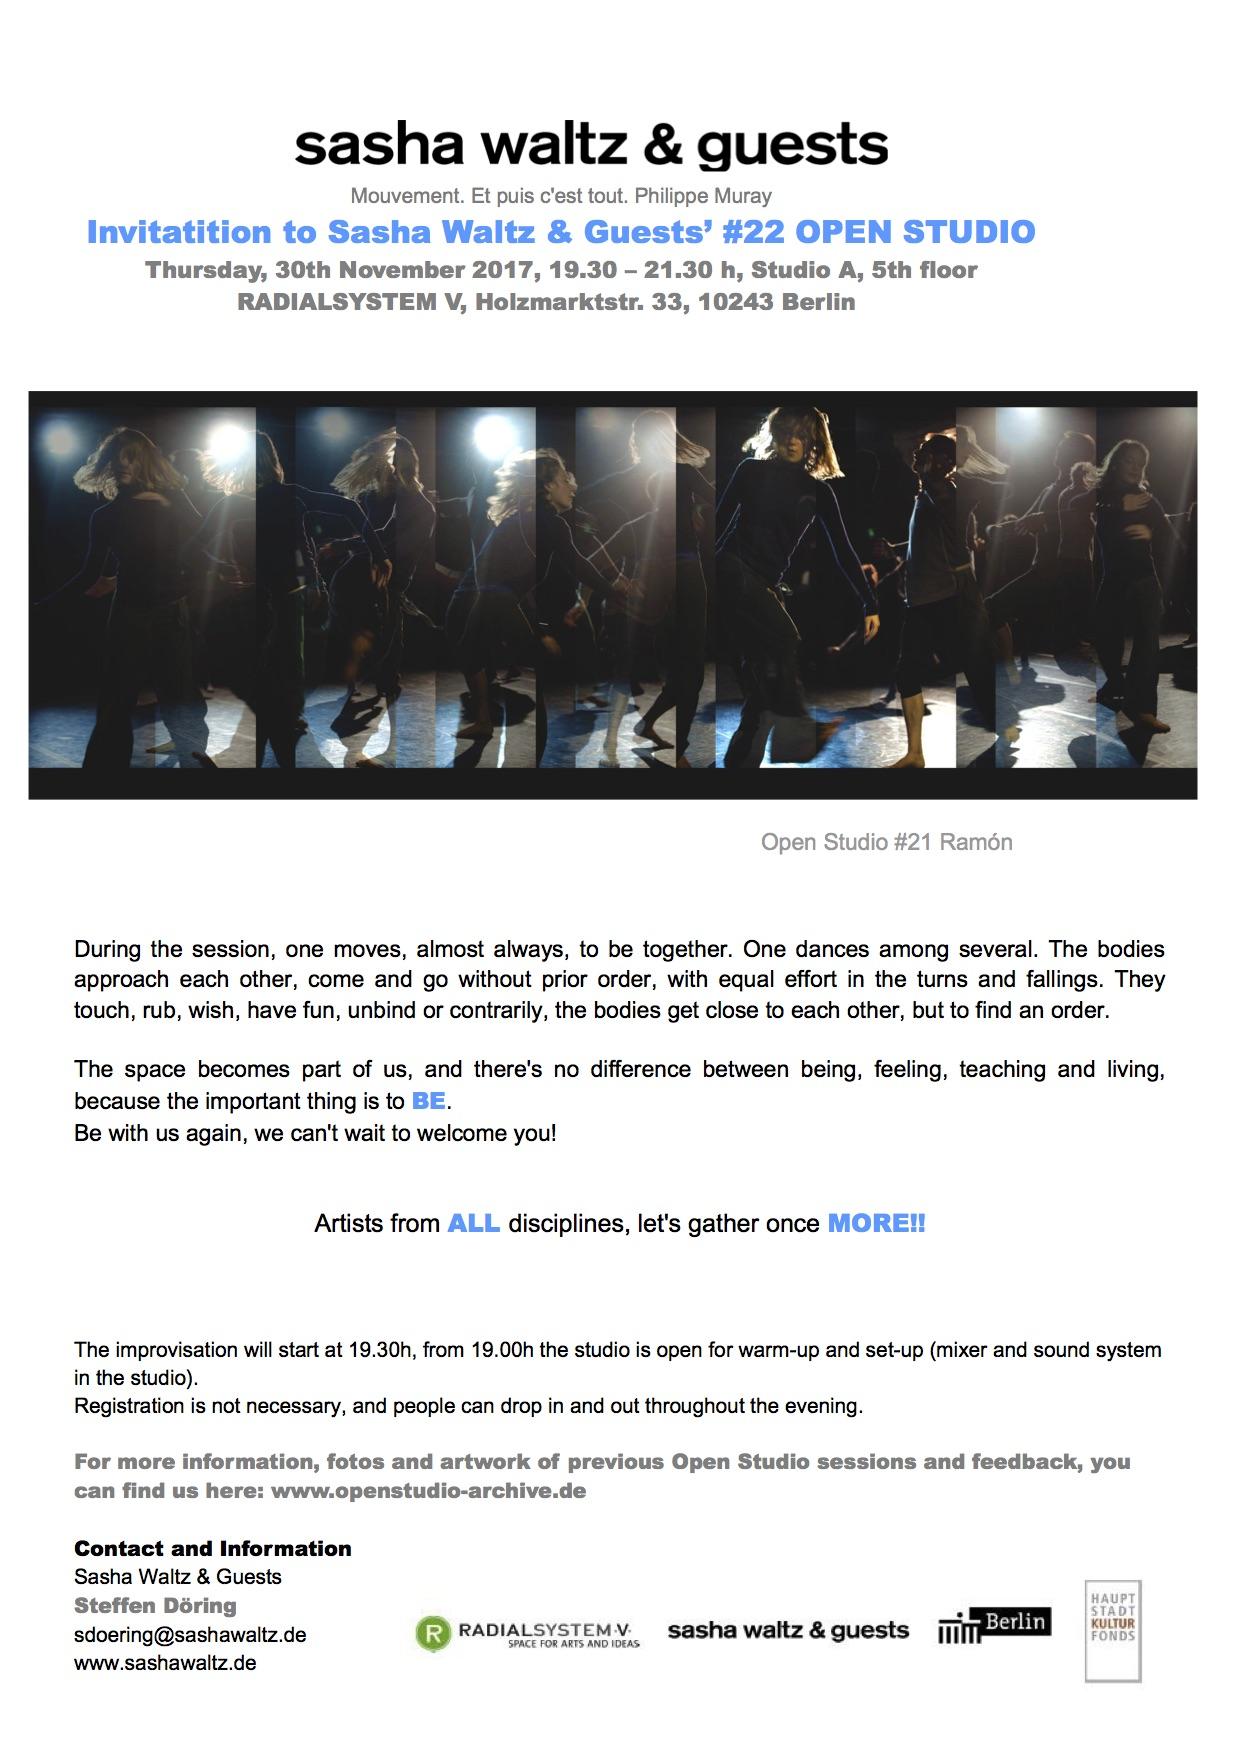 Open improvisation practice rosabel huguet invitation open studio 22 stopboris Image collections